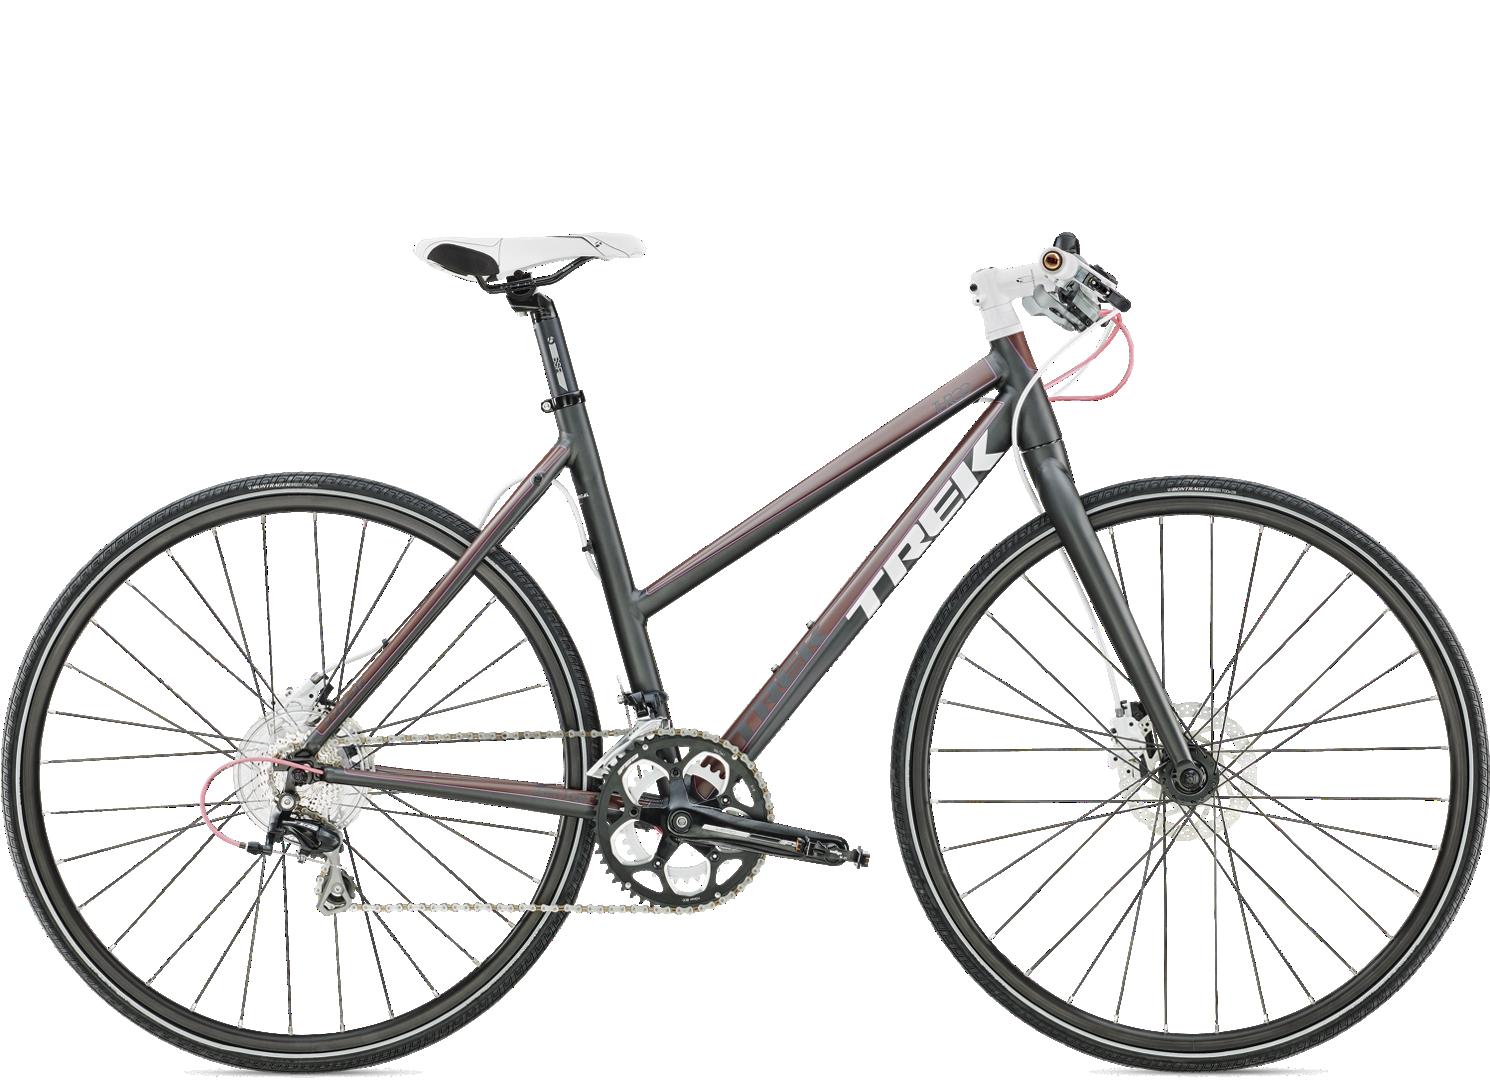 2015 Zektor Three Stagger DK - Bike Archive - Trek Bicycle